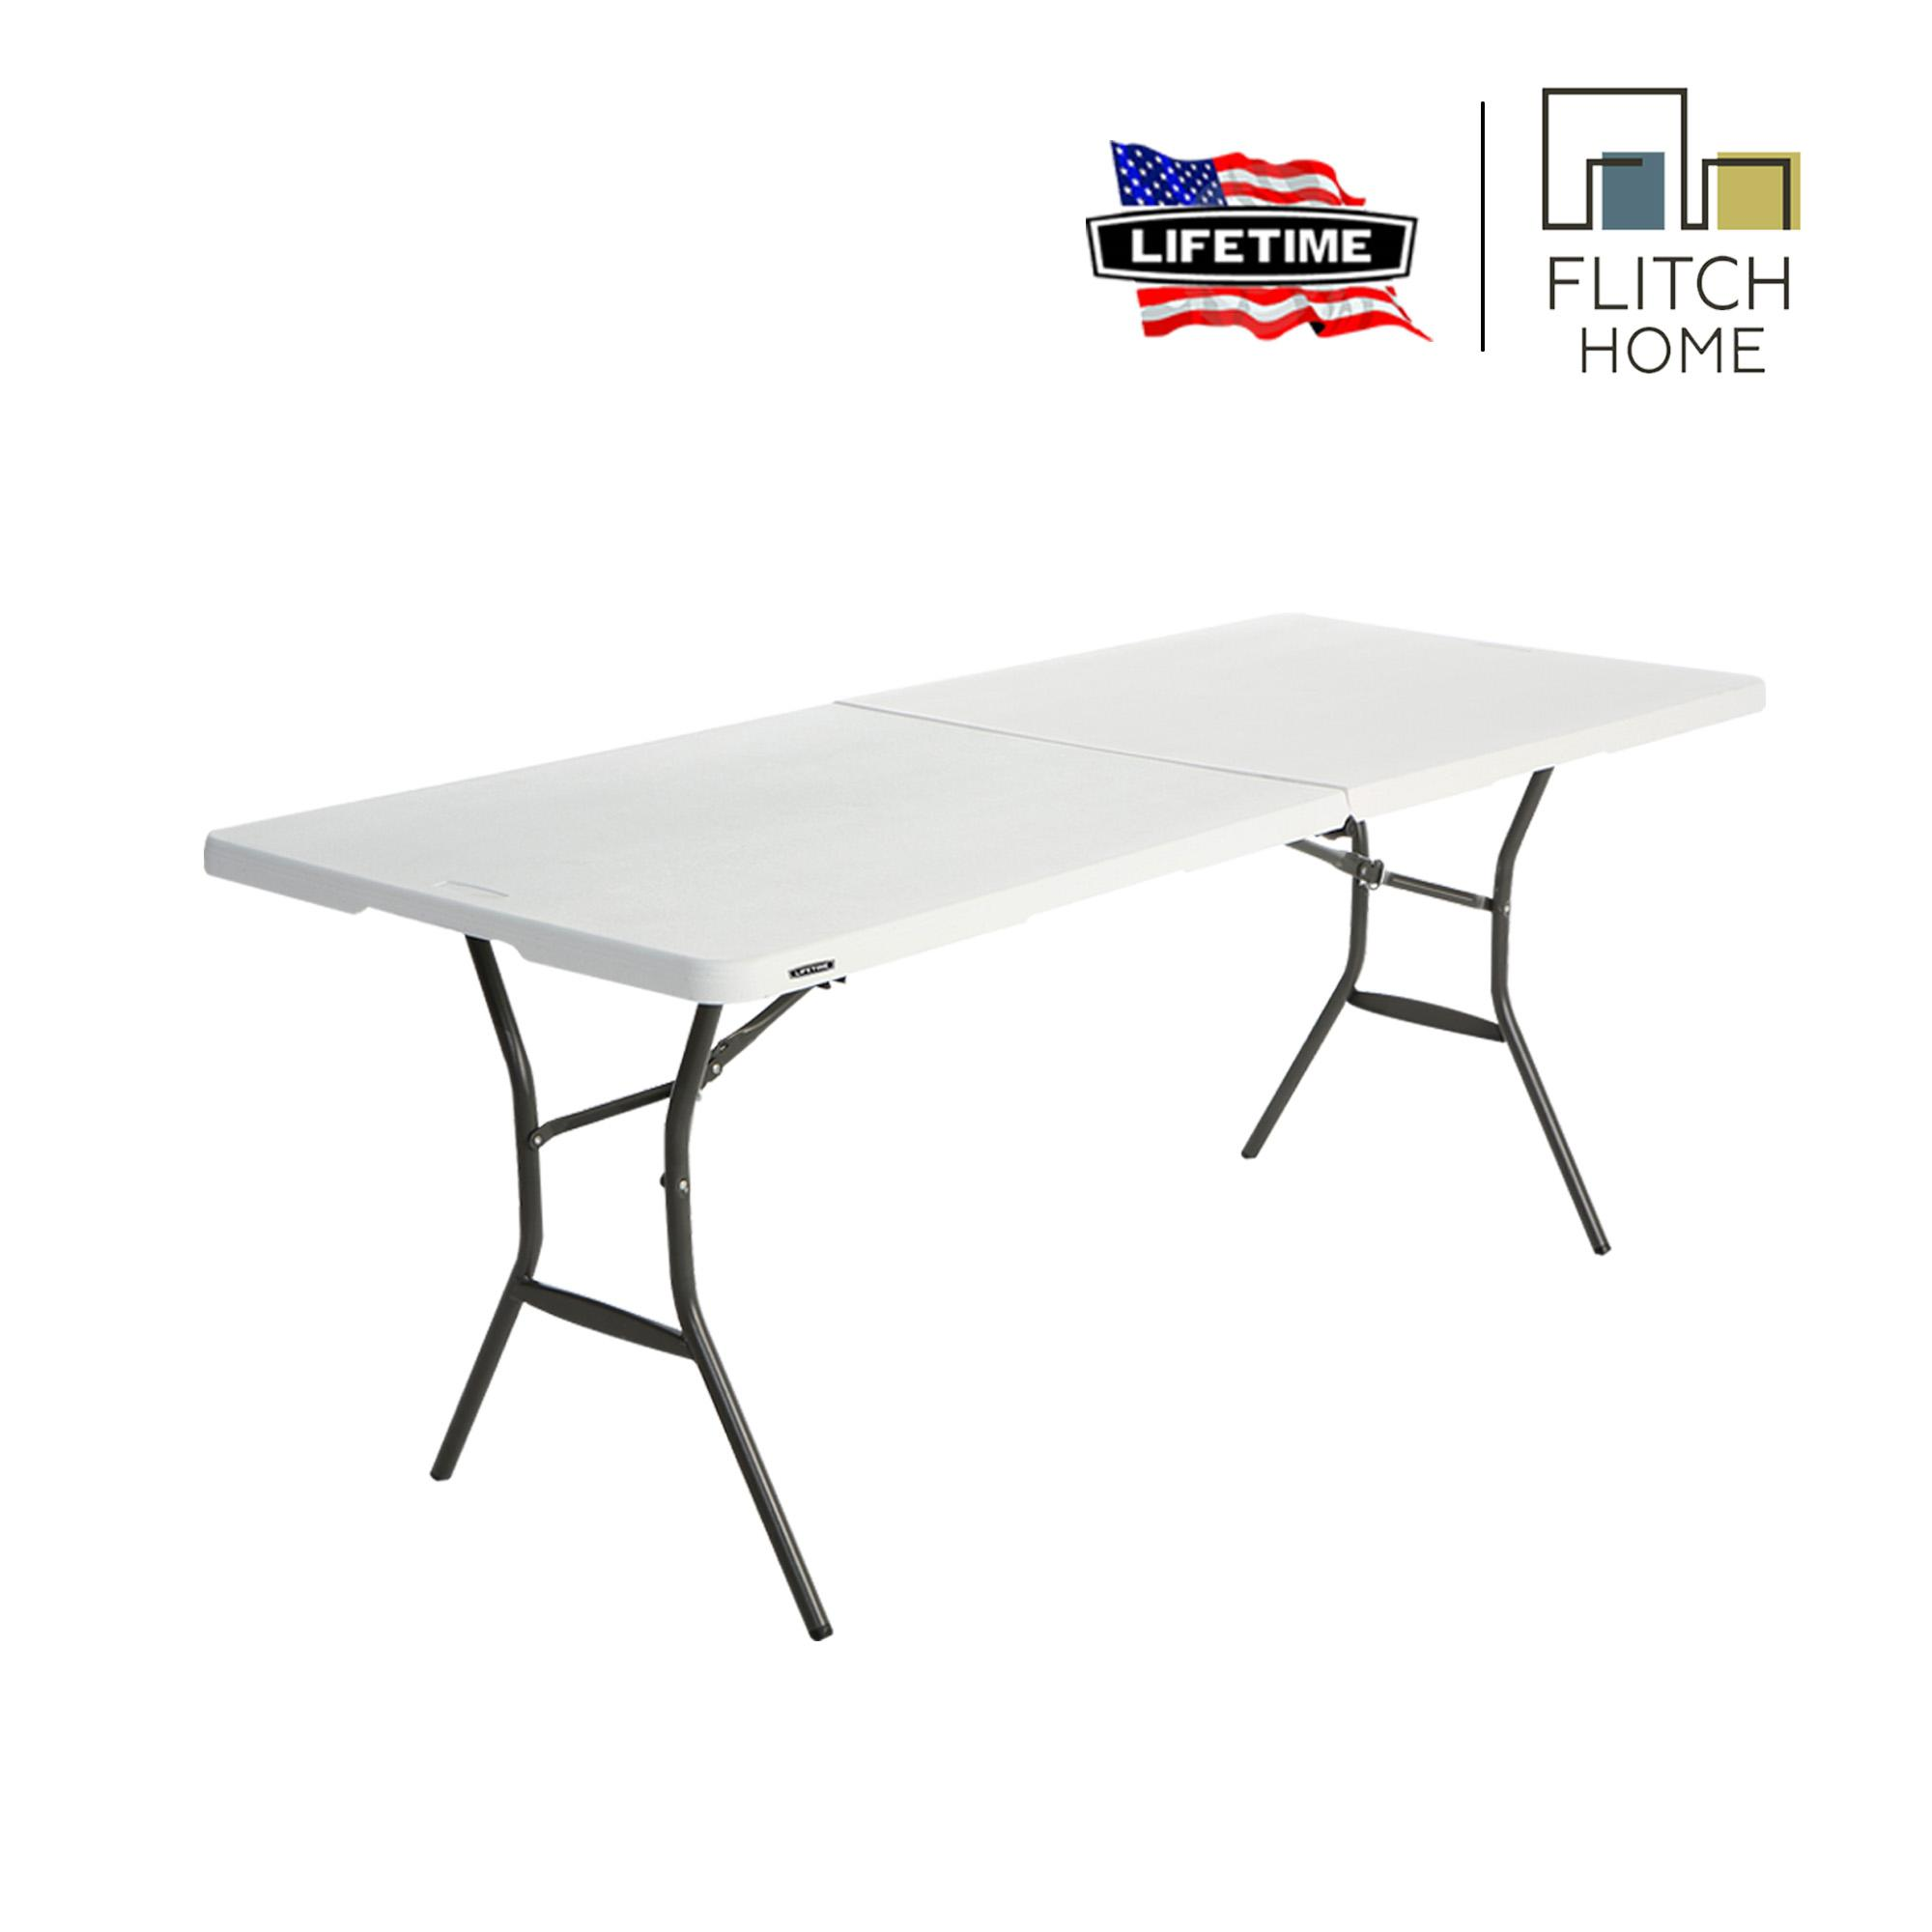 Lifetime 6 FT Fold-In-Half Table - White